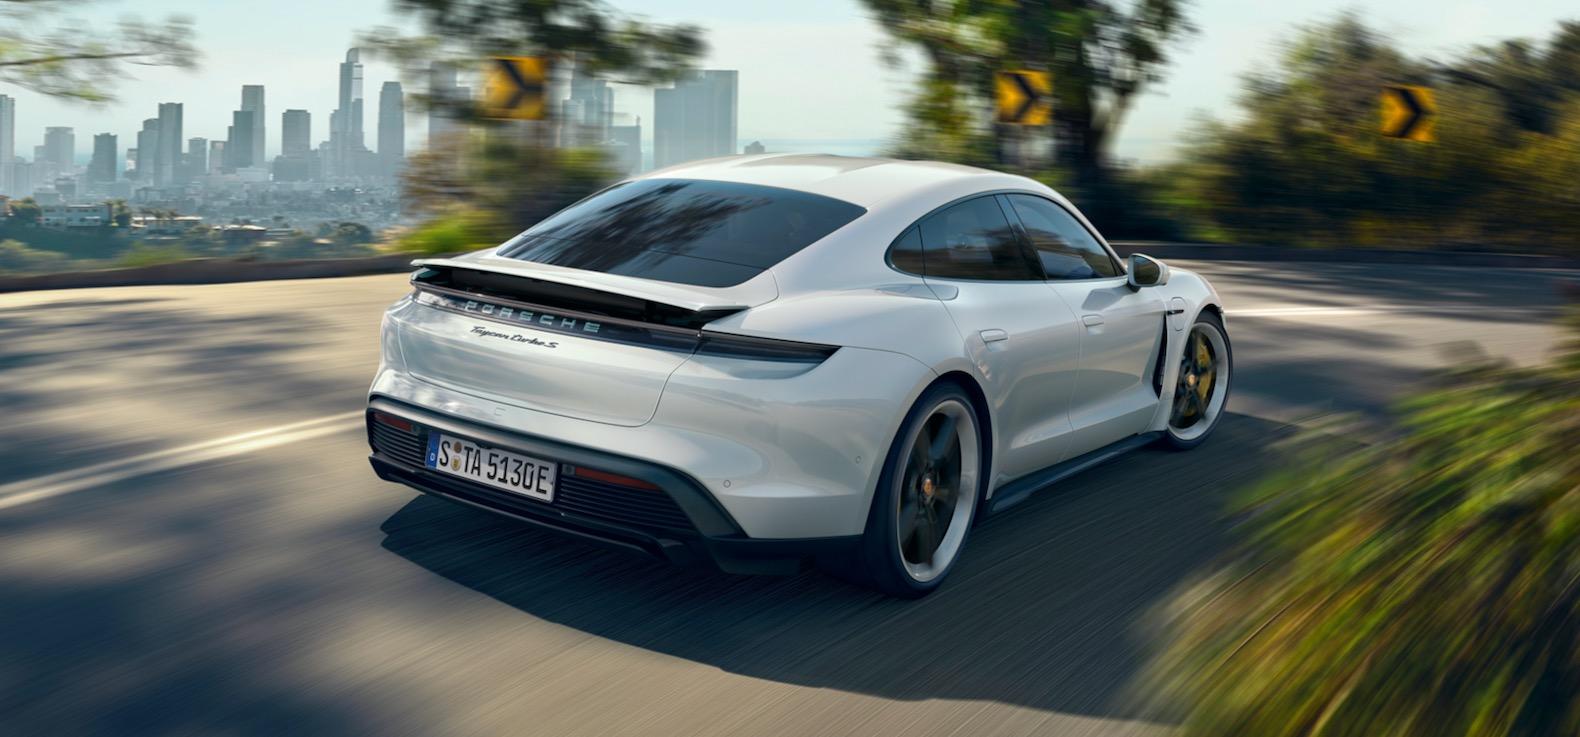 2021 Porsche Taycan Gets Some Upgrades The Torque Report